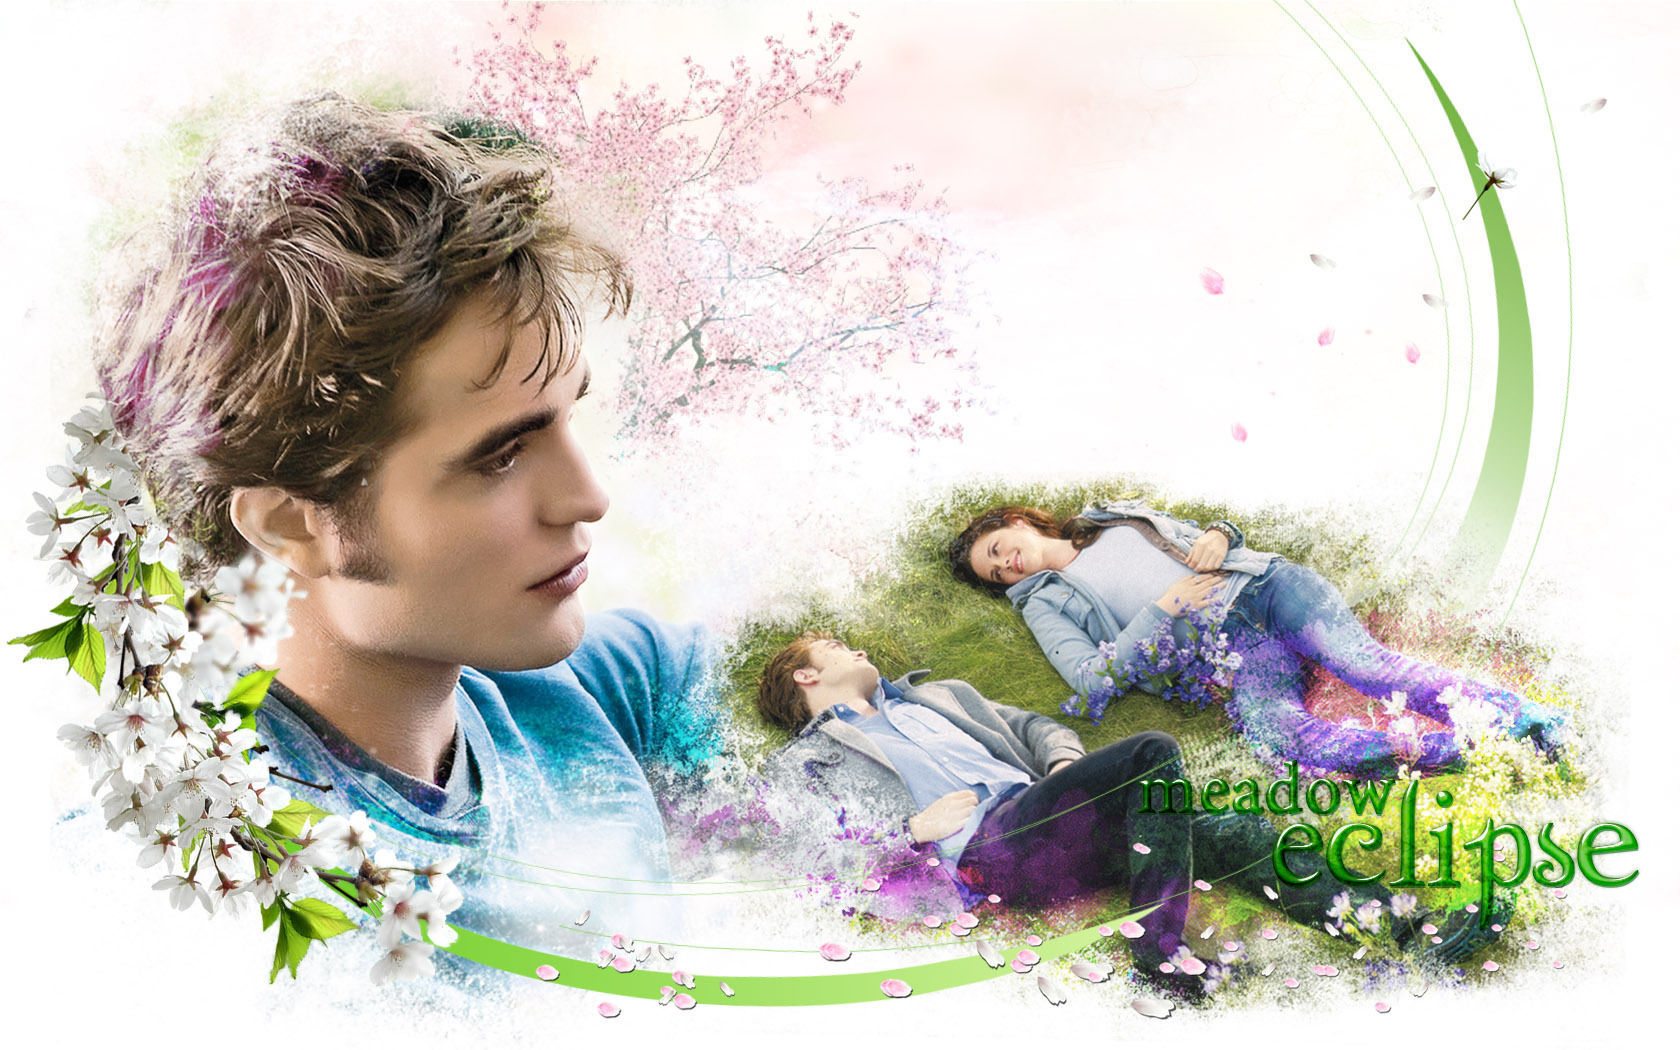 http://images2.fanpop.com/image/photos/9700000/ECLIPSE-MOVIE-twilight-series-9767720-1680-1050.jpg